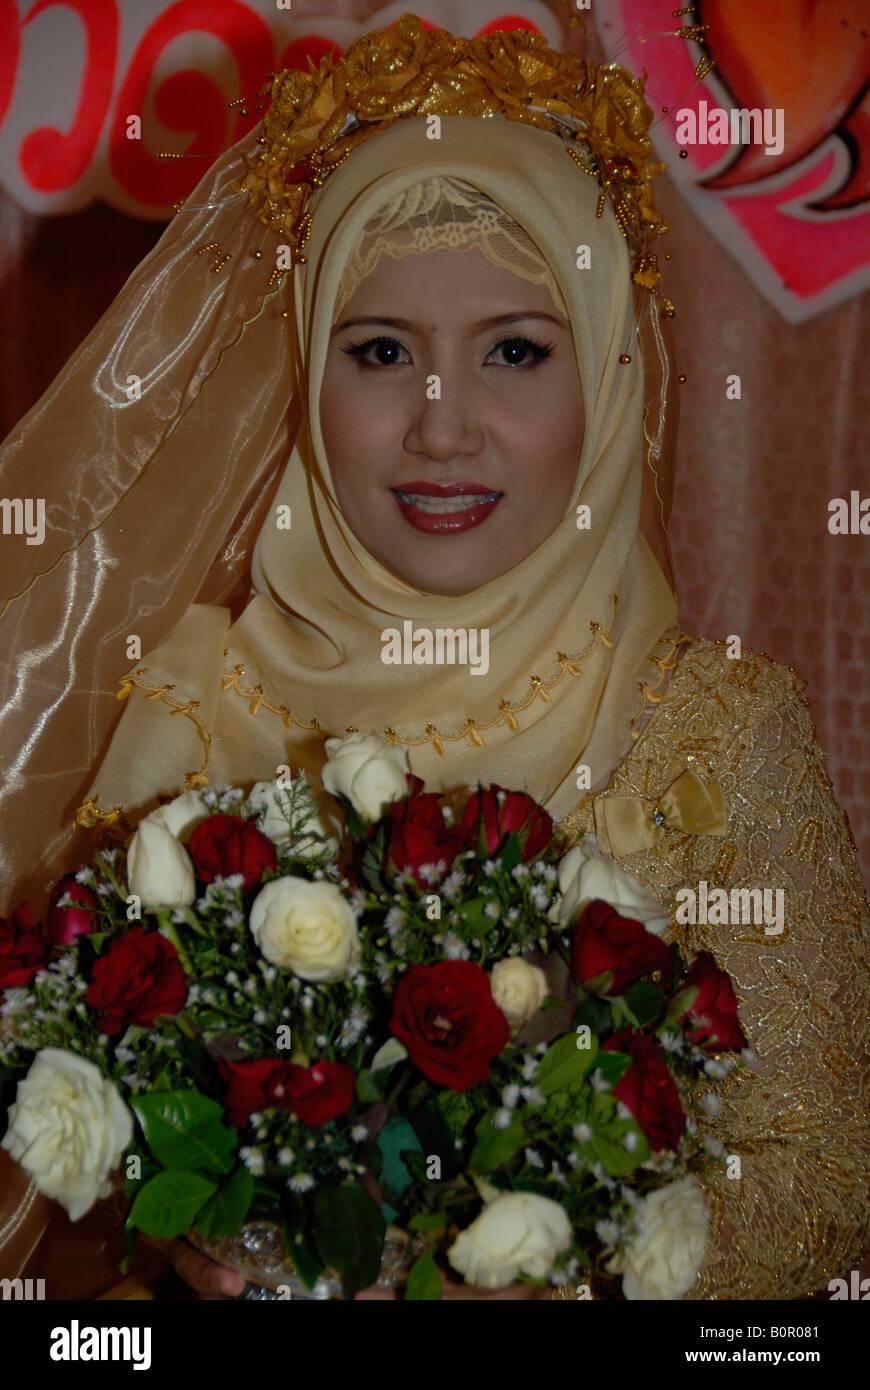 muslim bride, bangkok, thailand - Stock Image